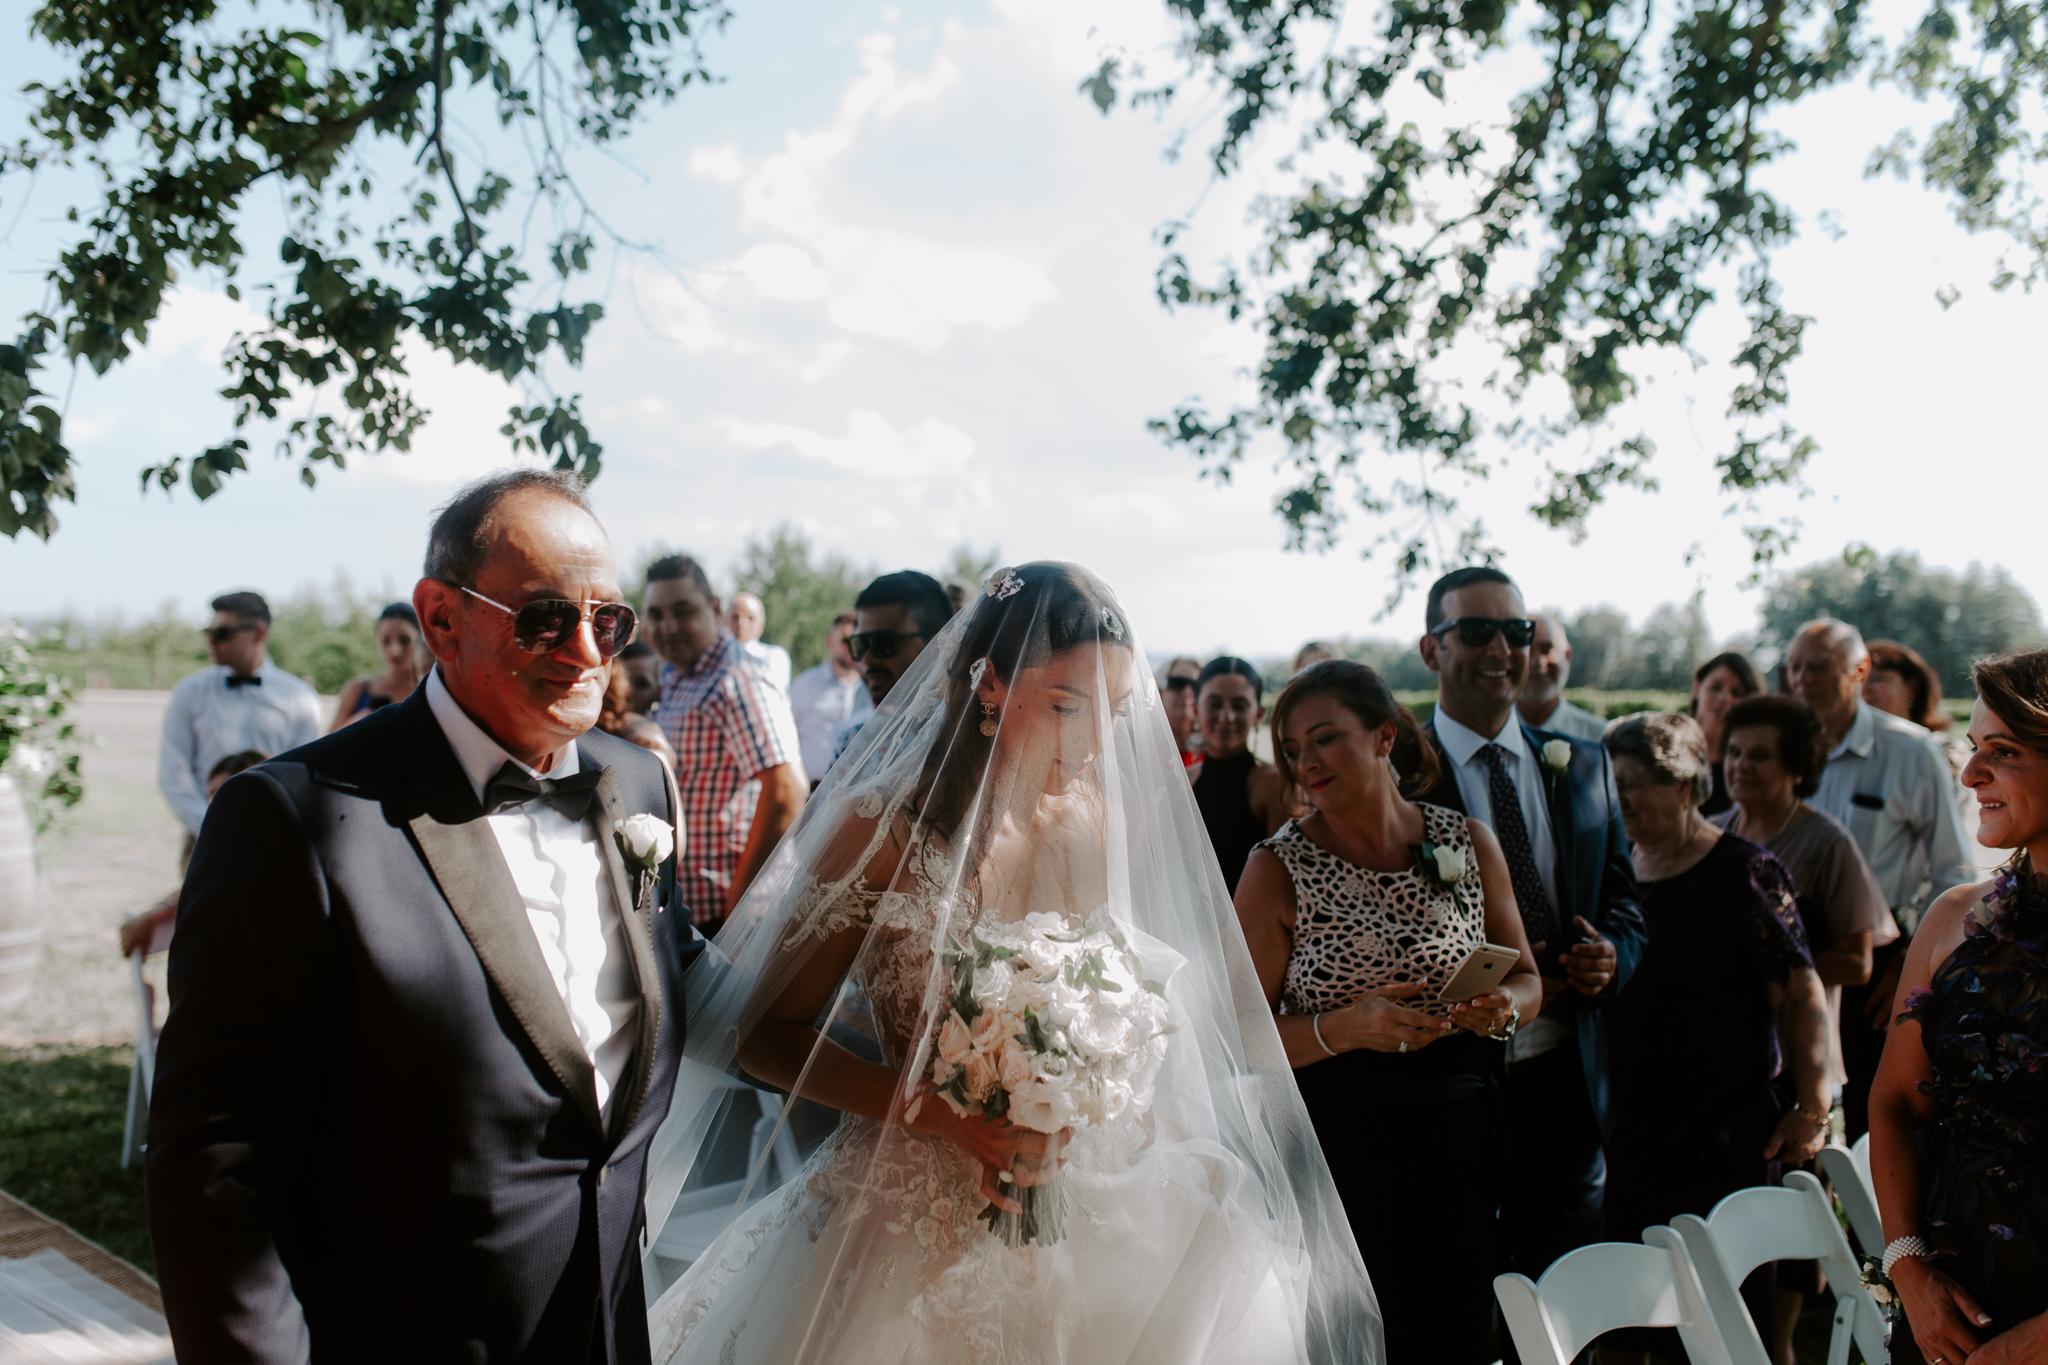 The-Stones-of-Yarra-Valley-Wedding-EmotionsandMathPhotography-114.jpg